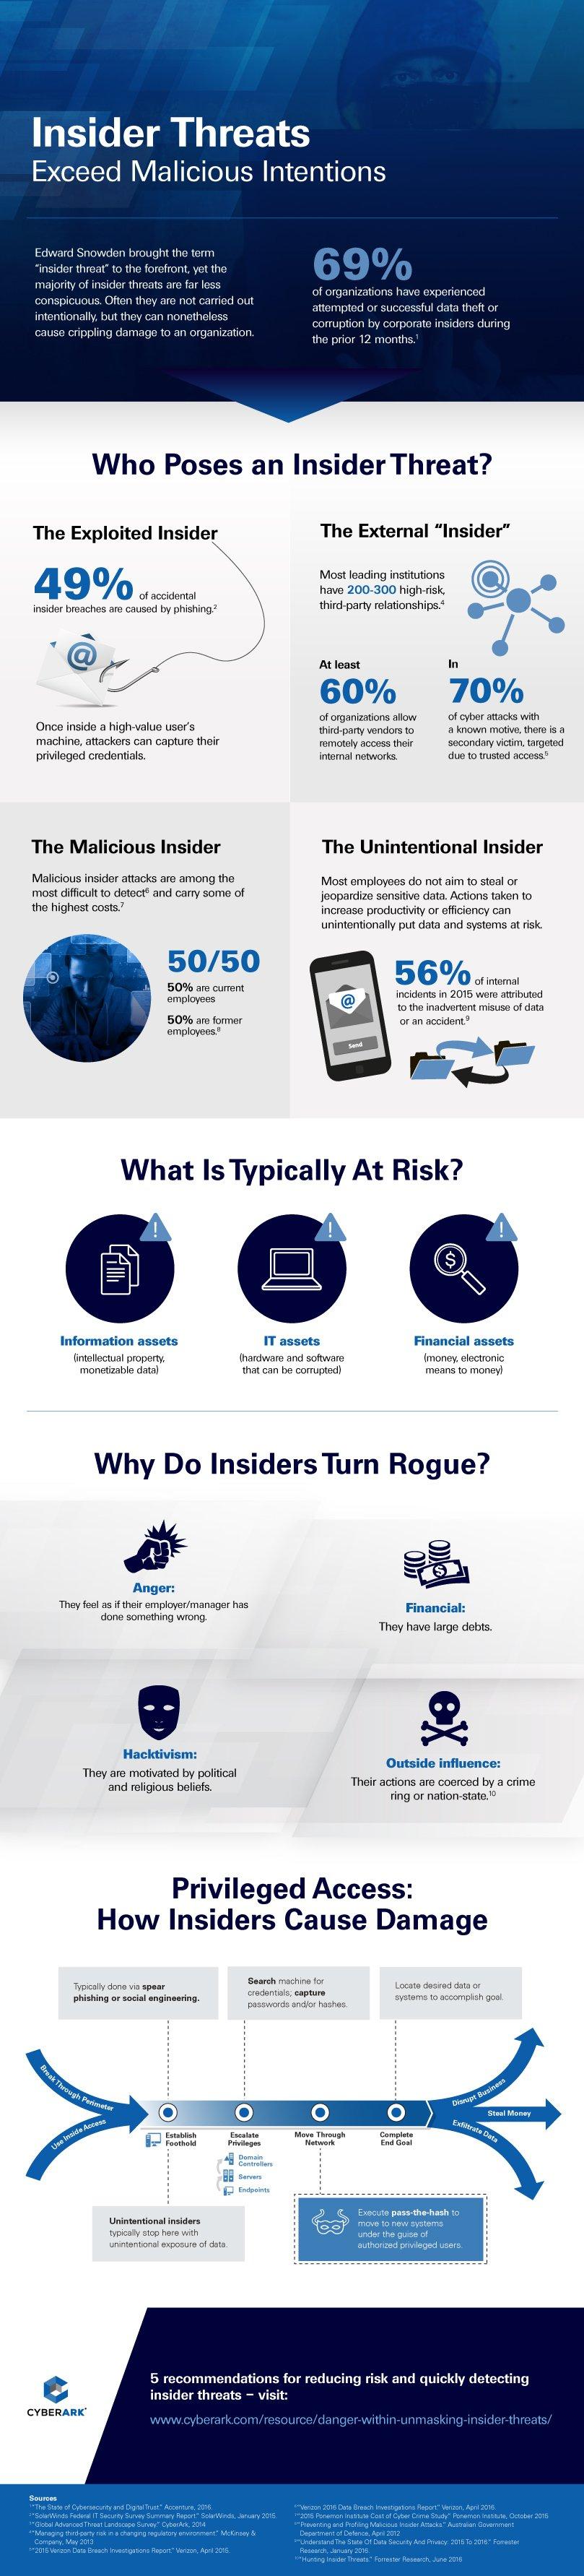 cyberark_insider-threat-_final_102616